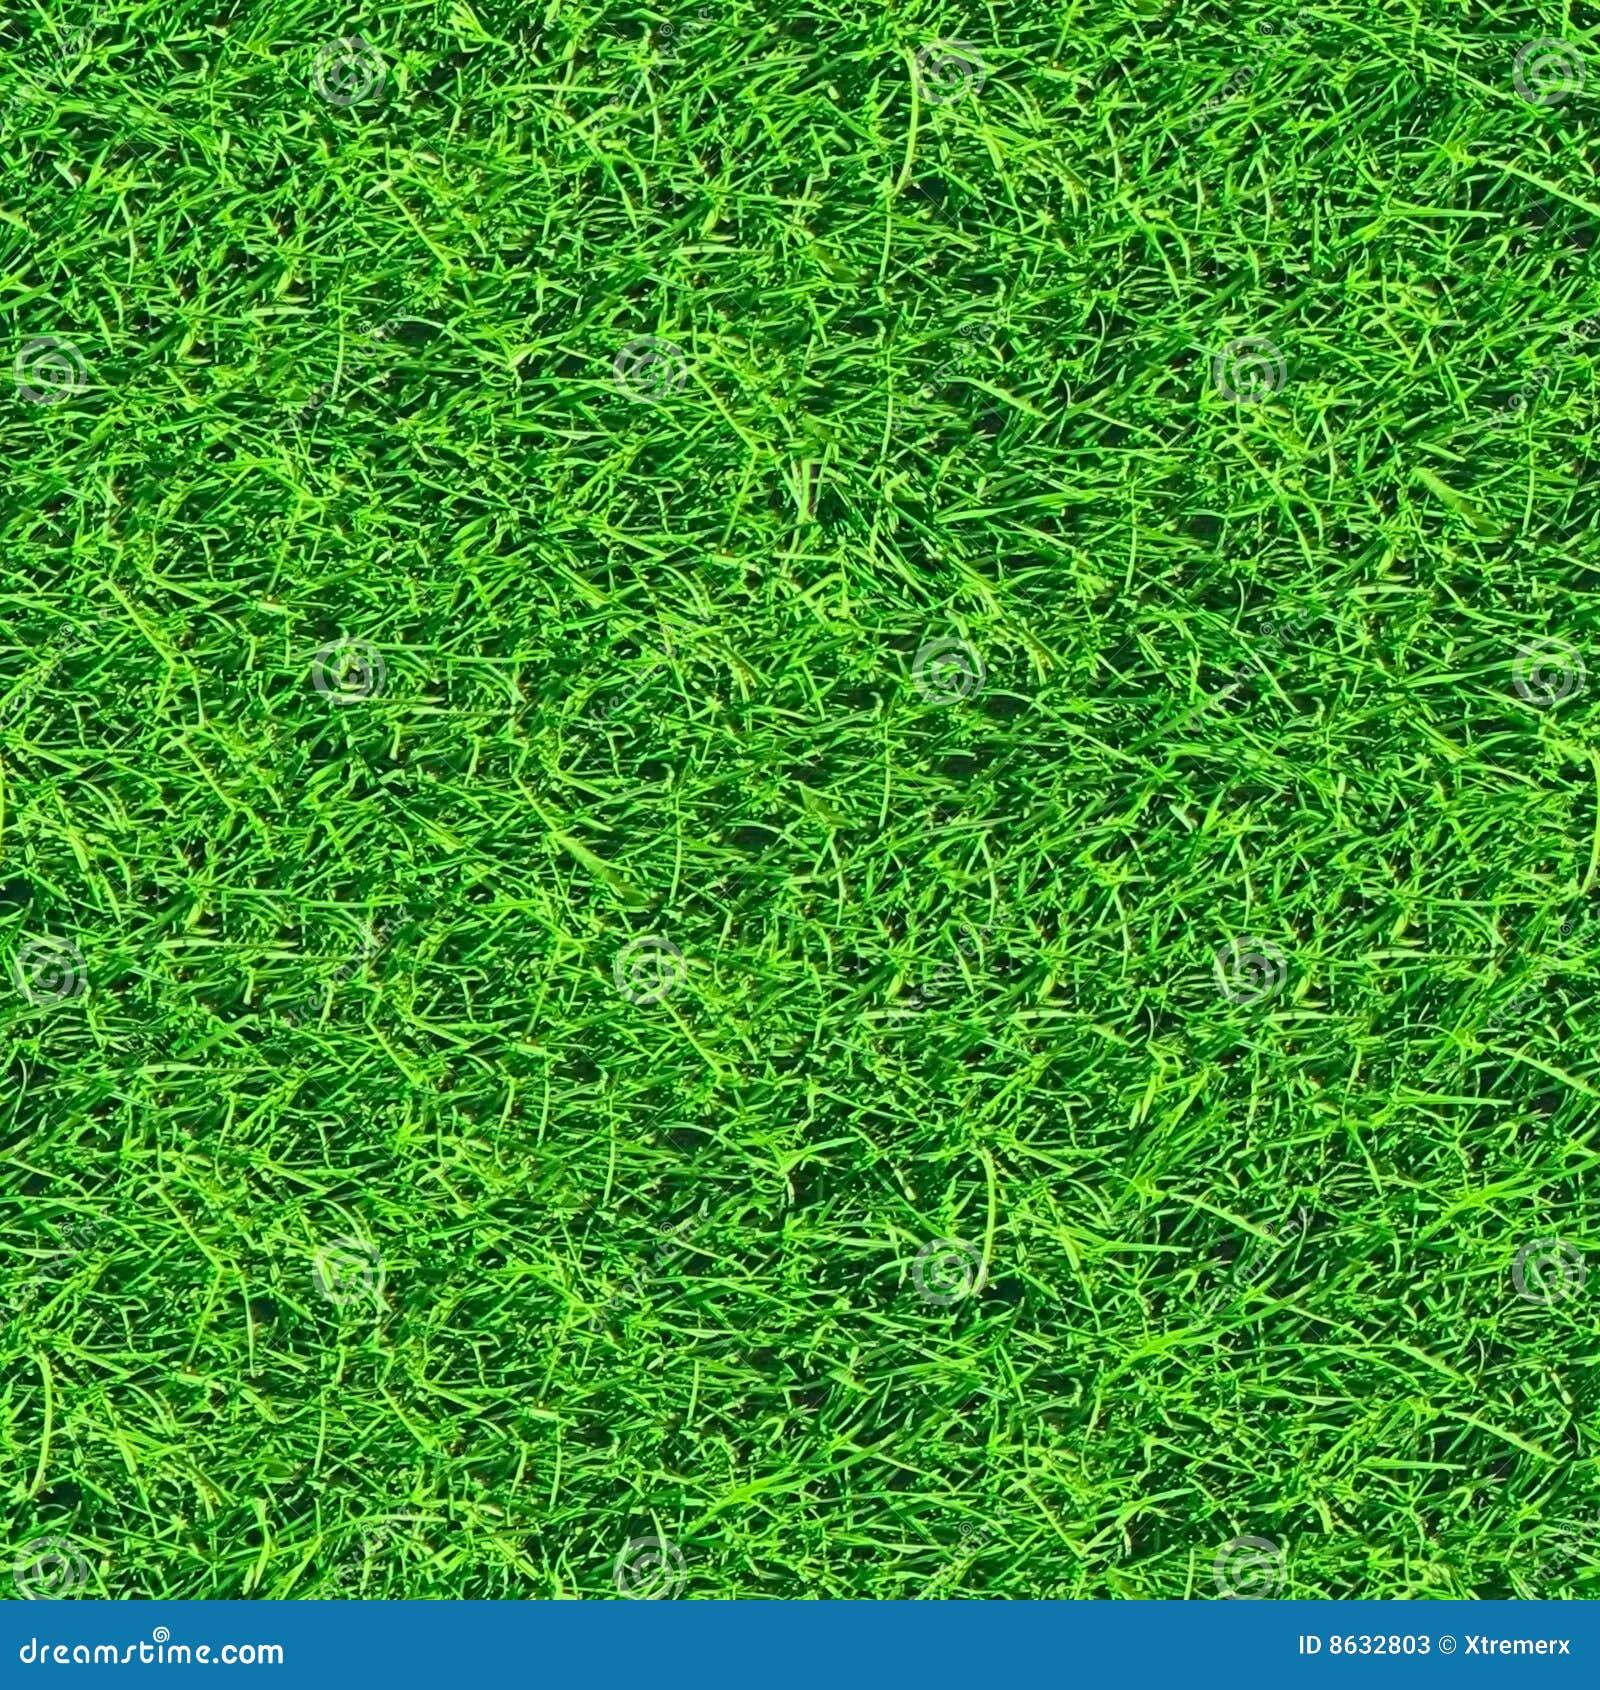 grass seamless pattern  2 of 2   stock photos